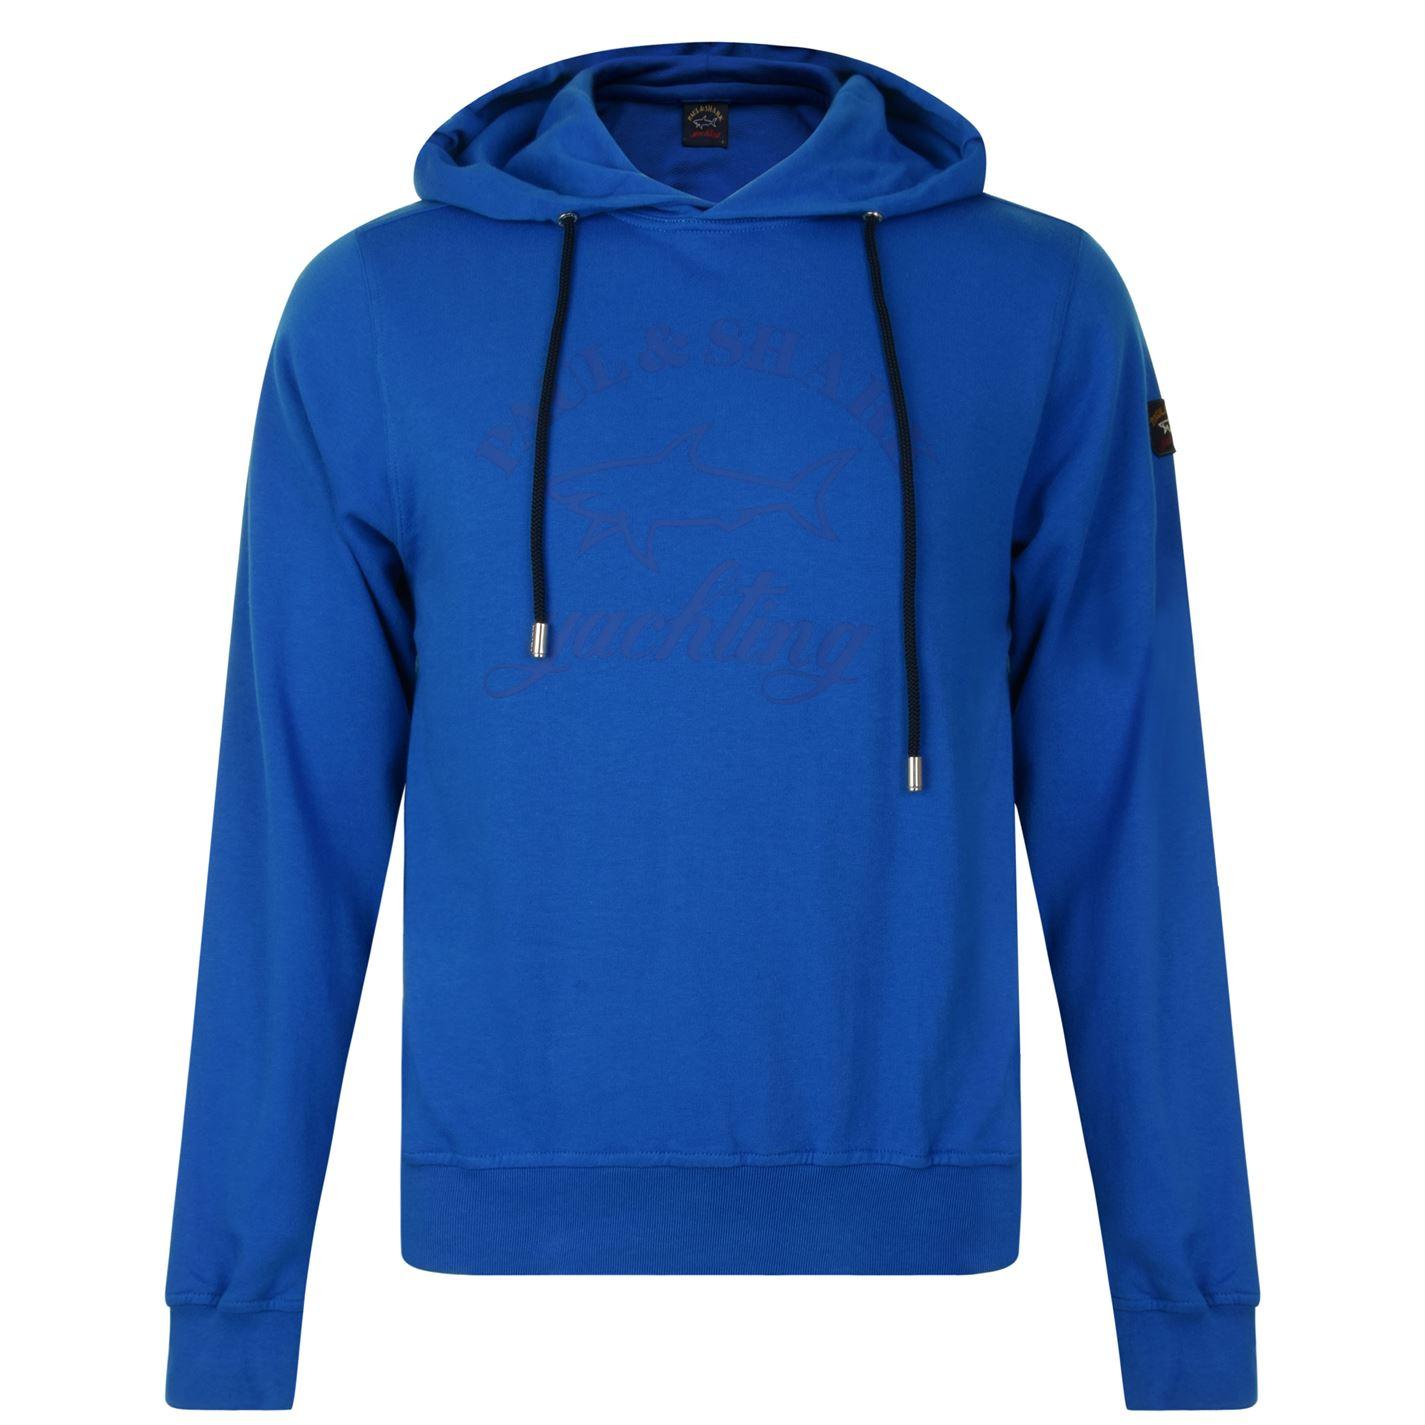 Paul And Shark Long Sleeved Hooded Sweatshirt Light Blue 424704 ... dddc0155f2d